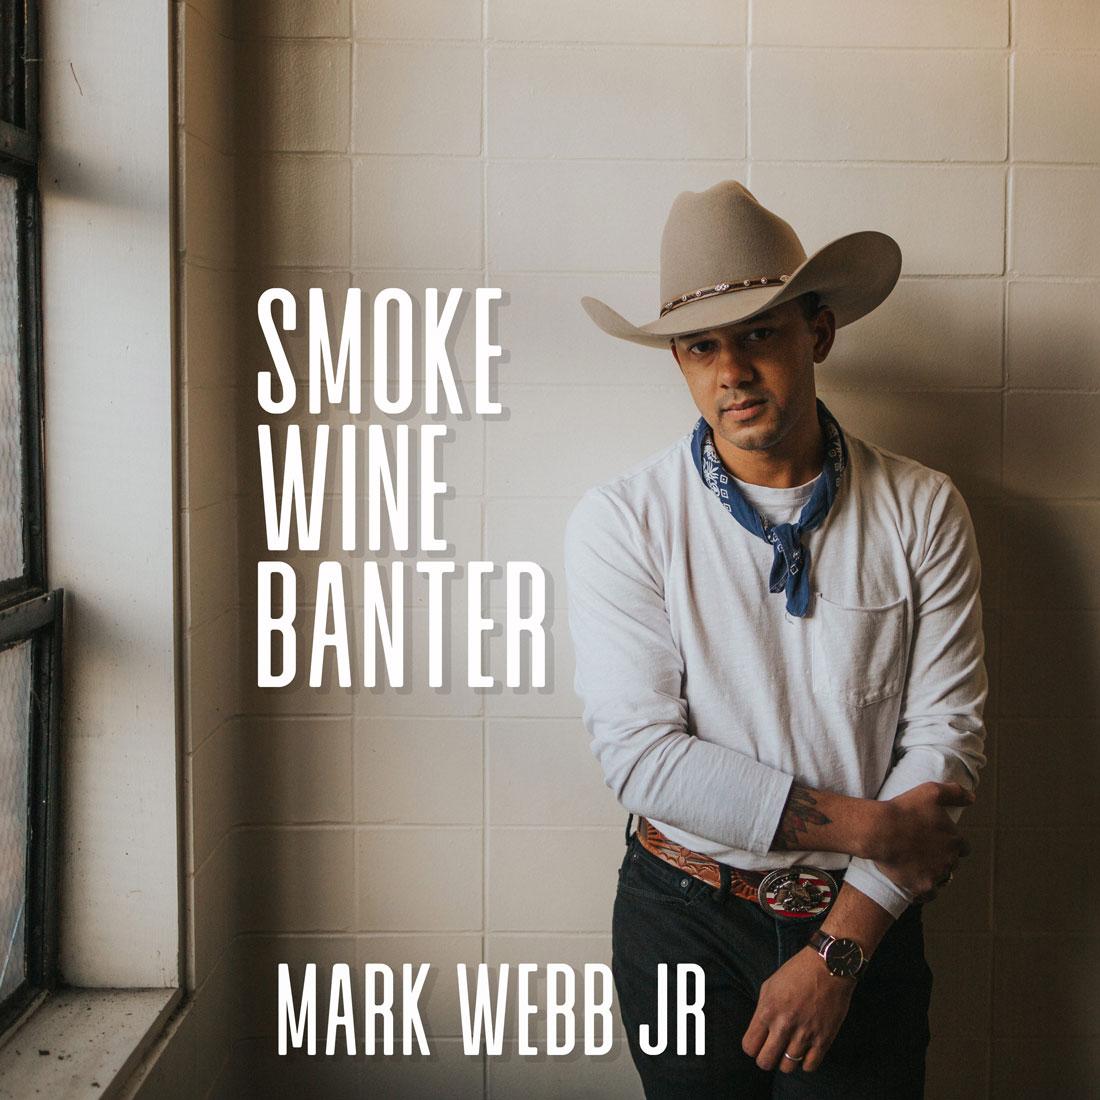 SmokeWineBanter_Cover_Websize.jpg